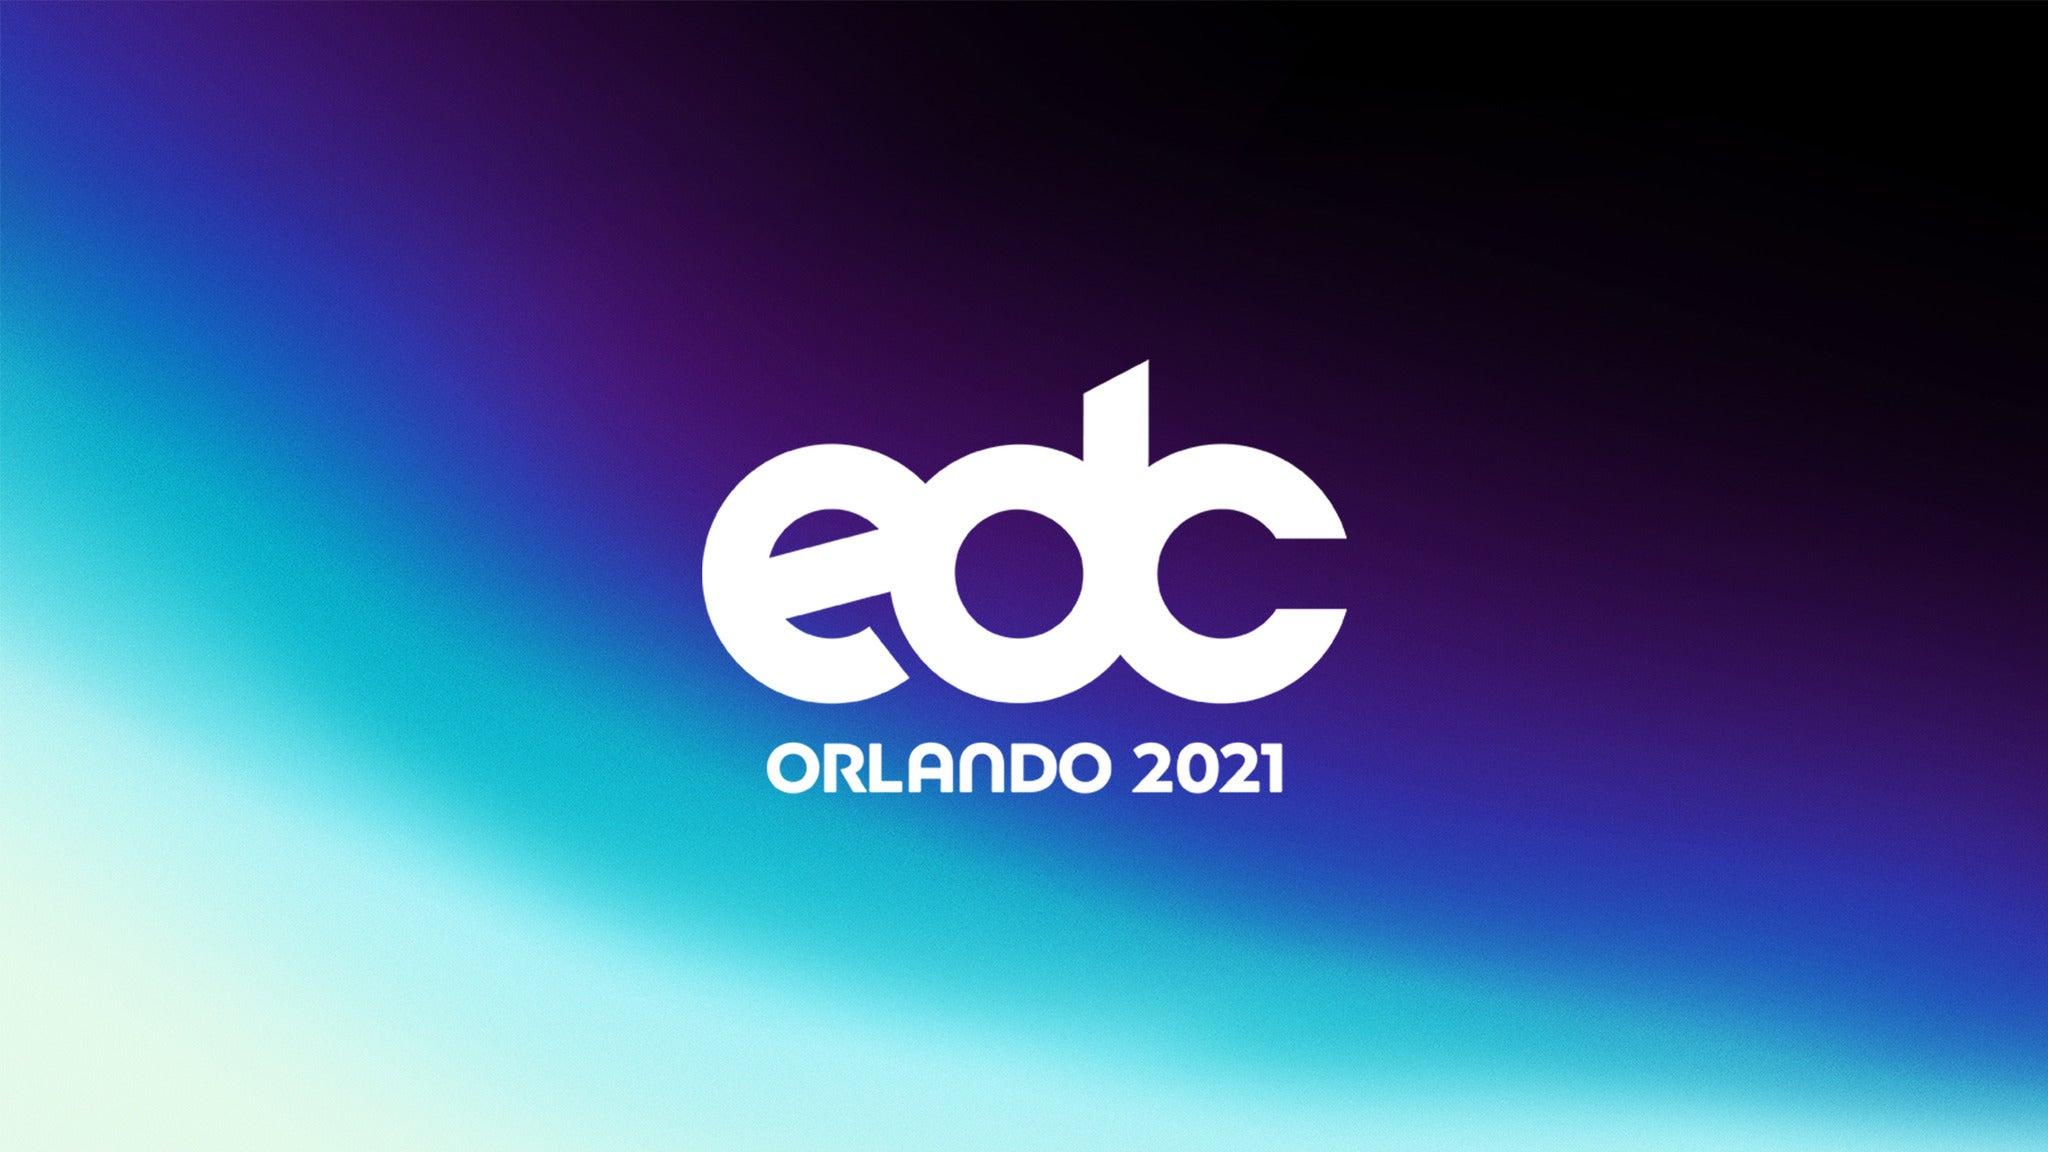 EDC Orlando at Tinker Field